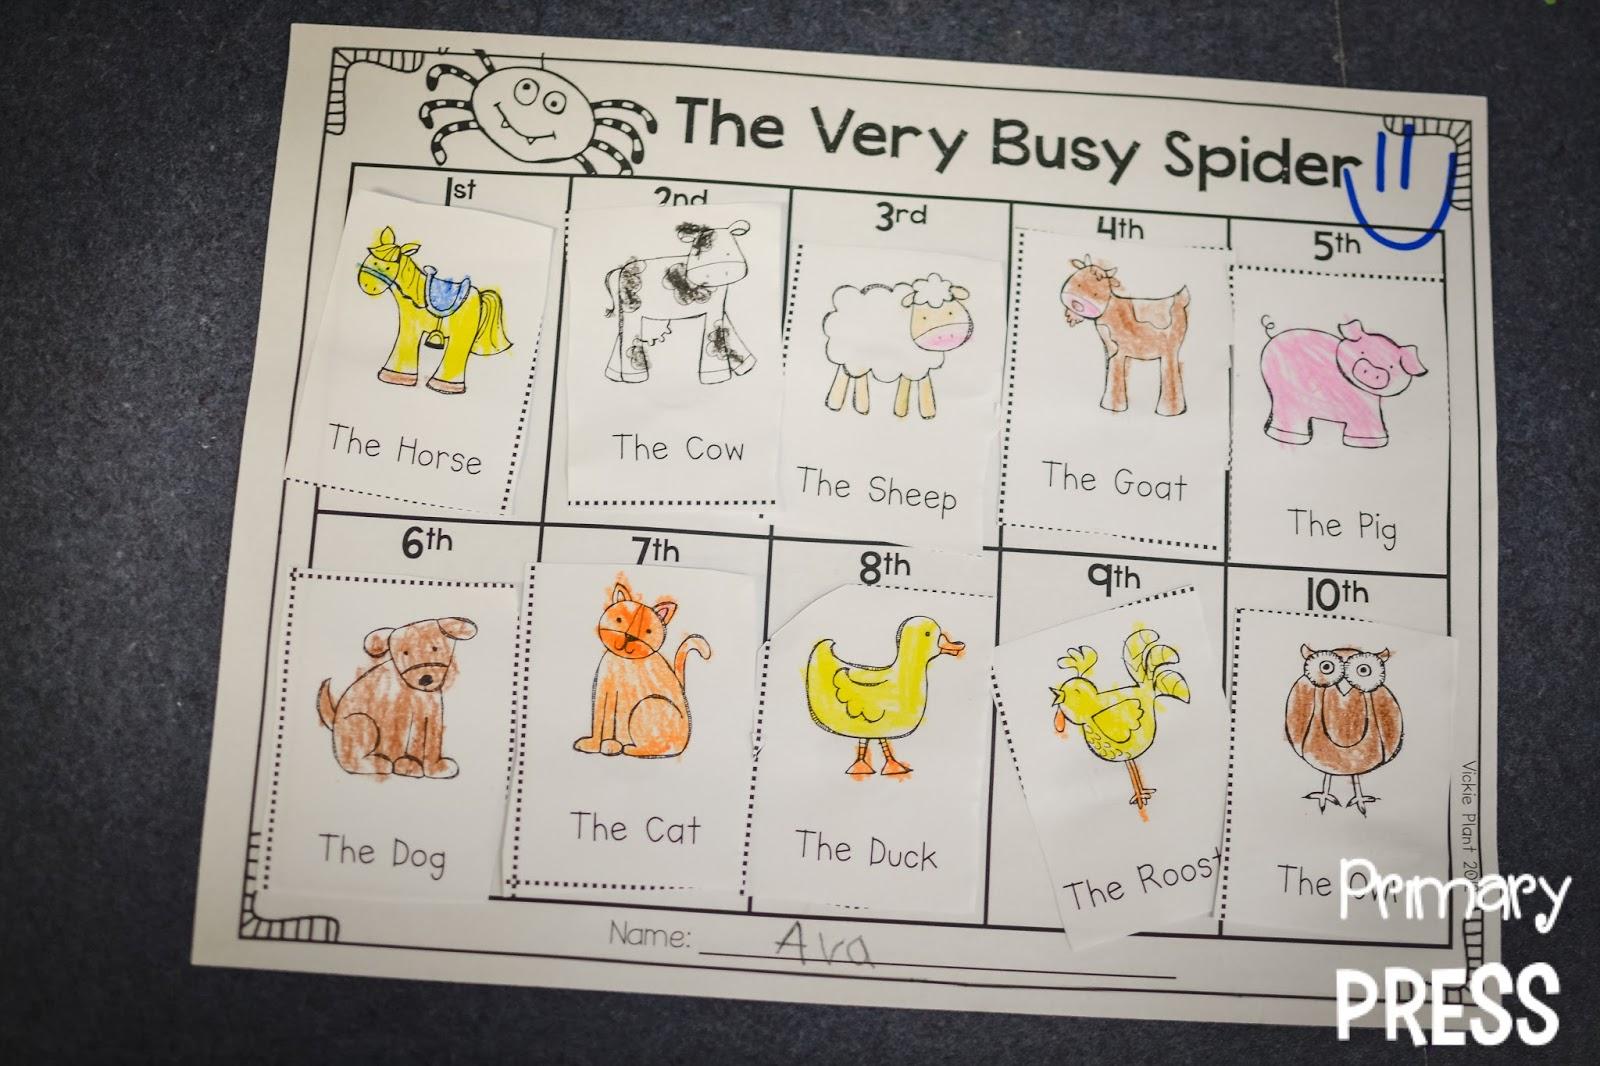 spiders primary press